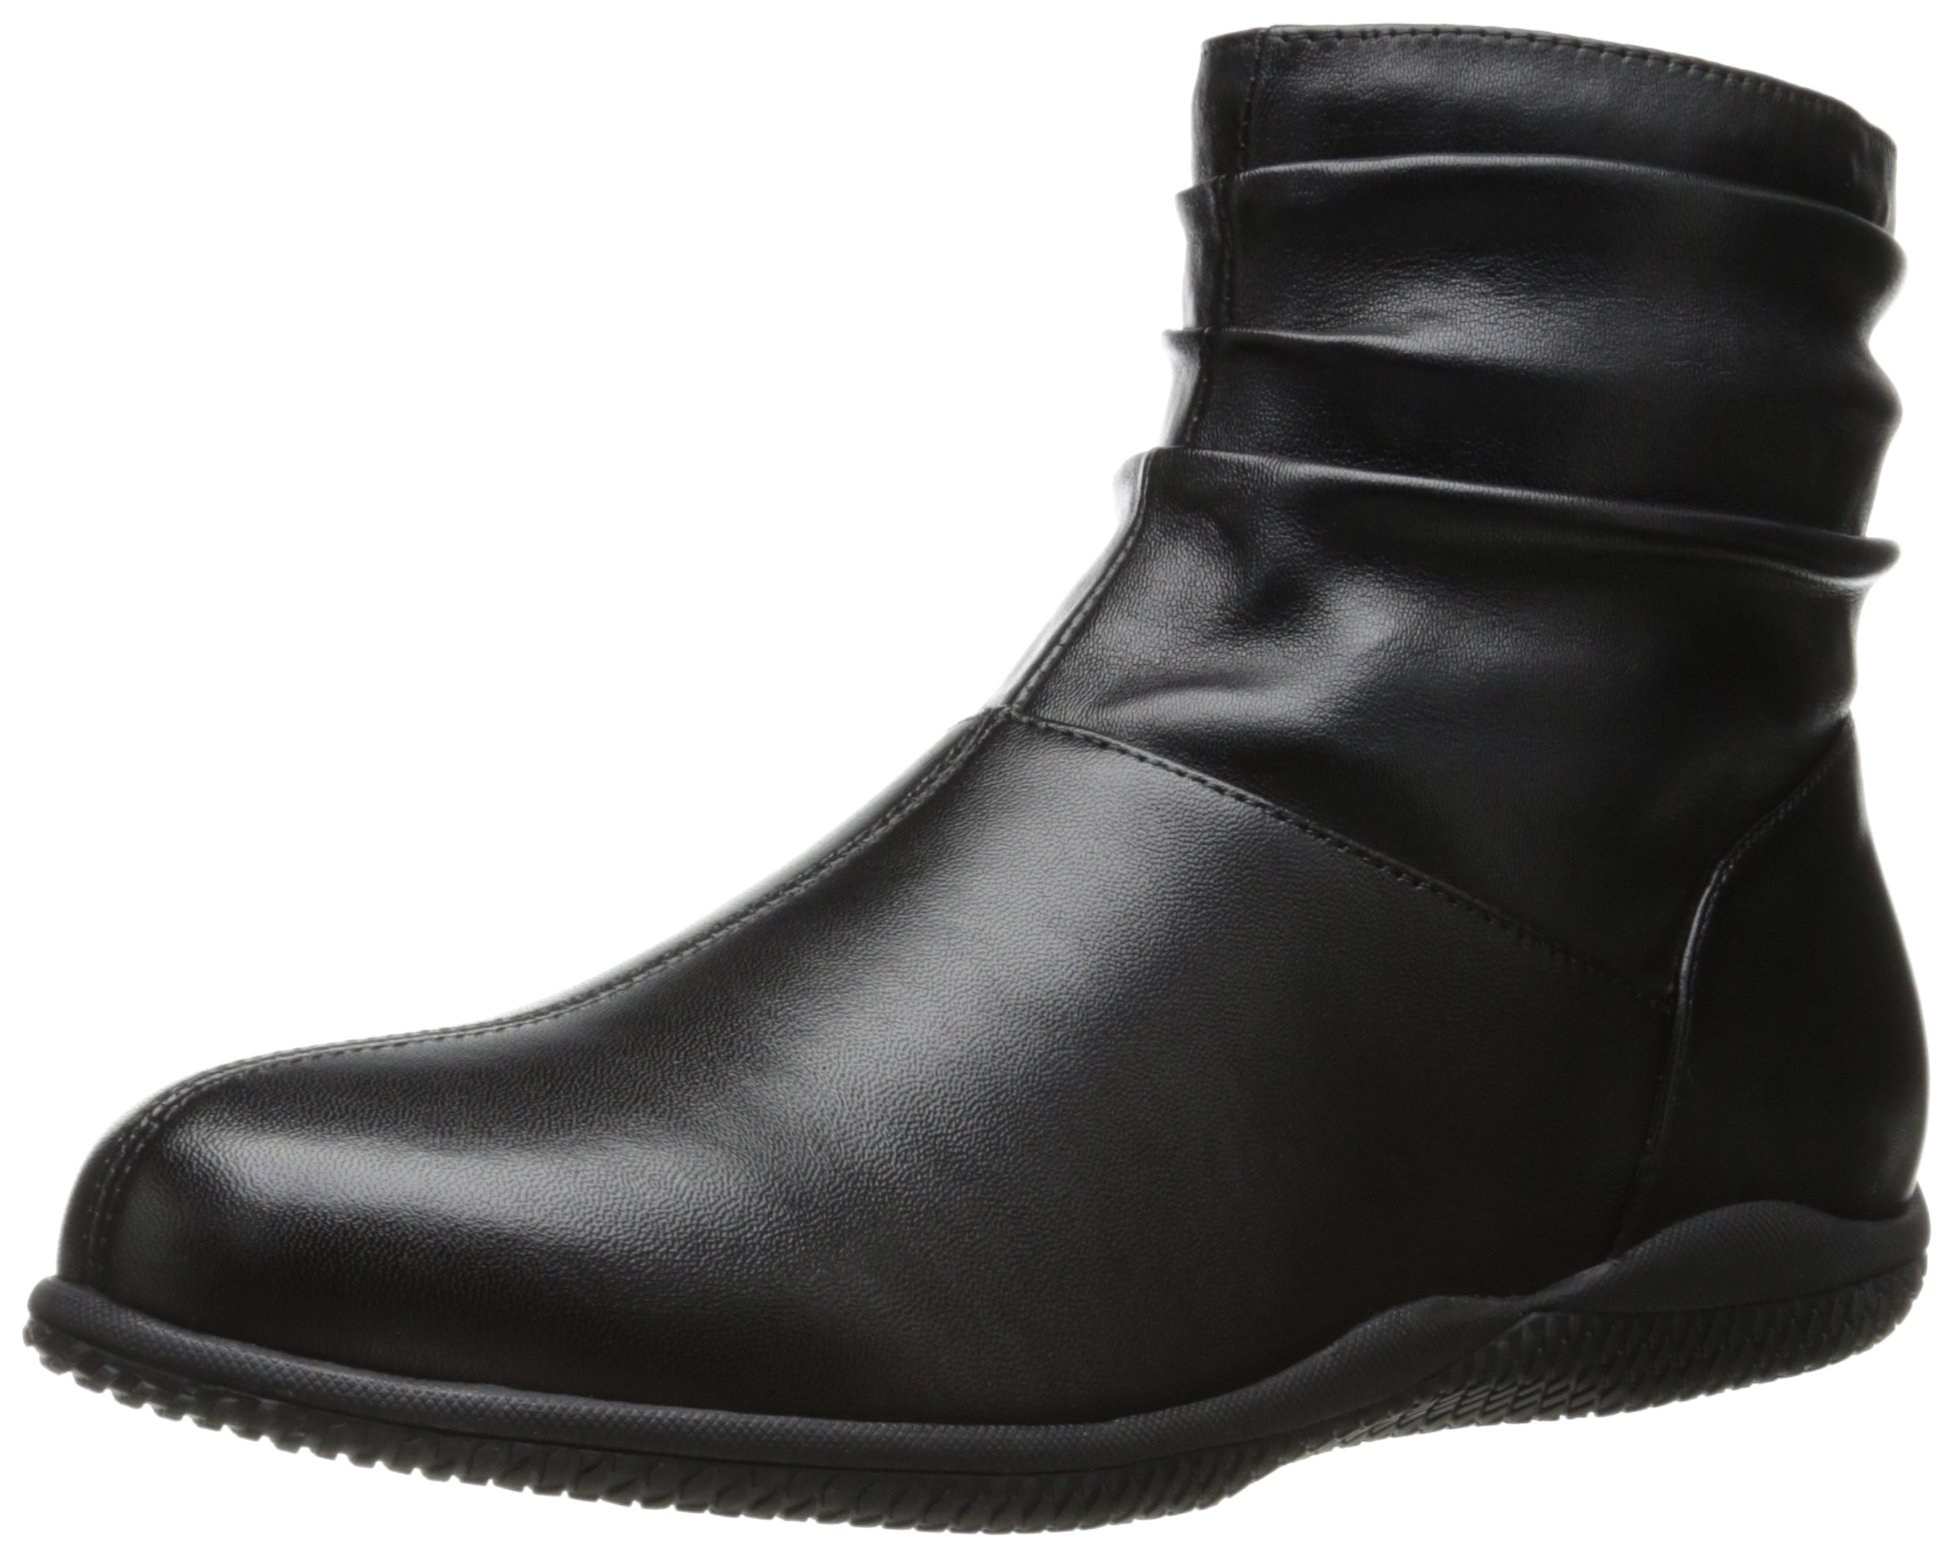 Softwalk Women's Hanover Boot,Black,8 W US